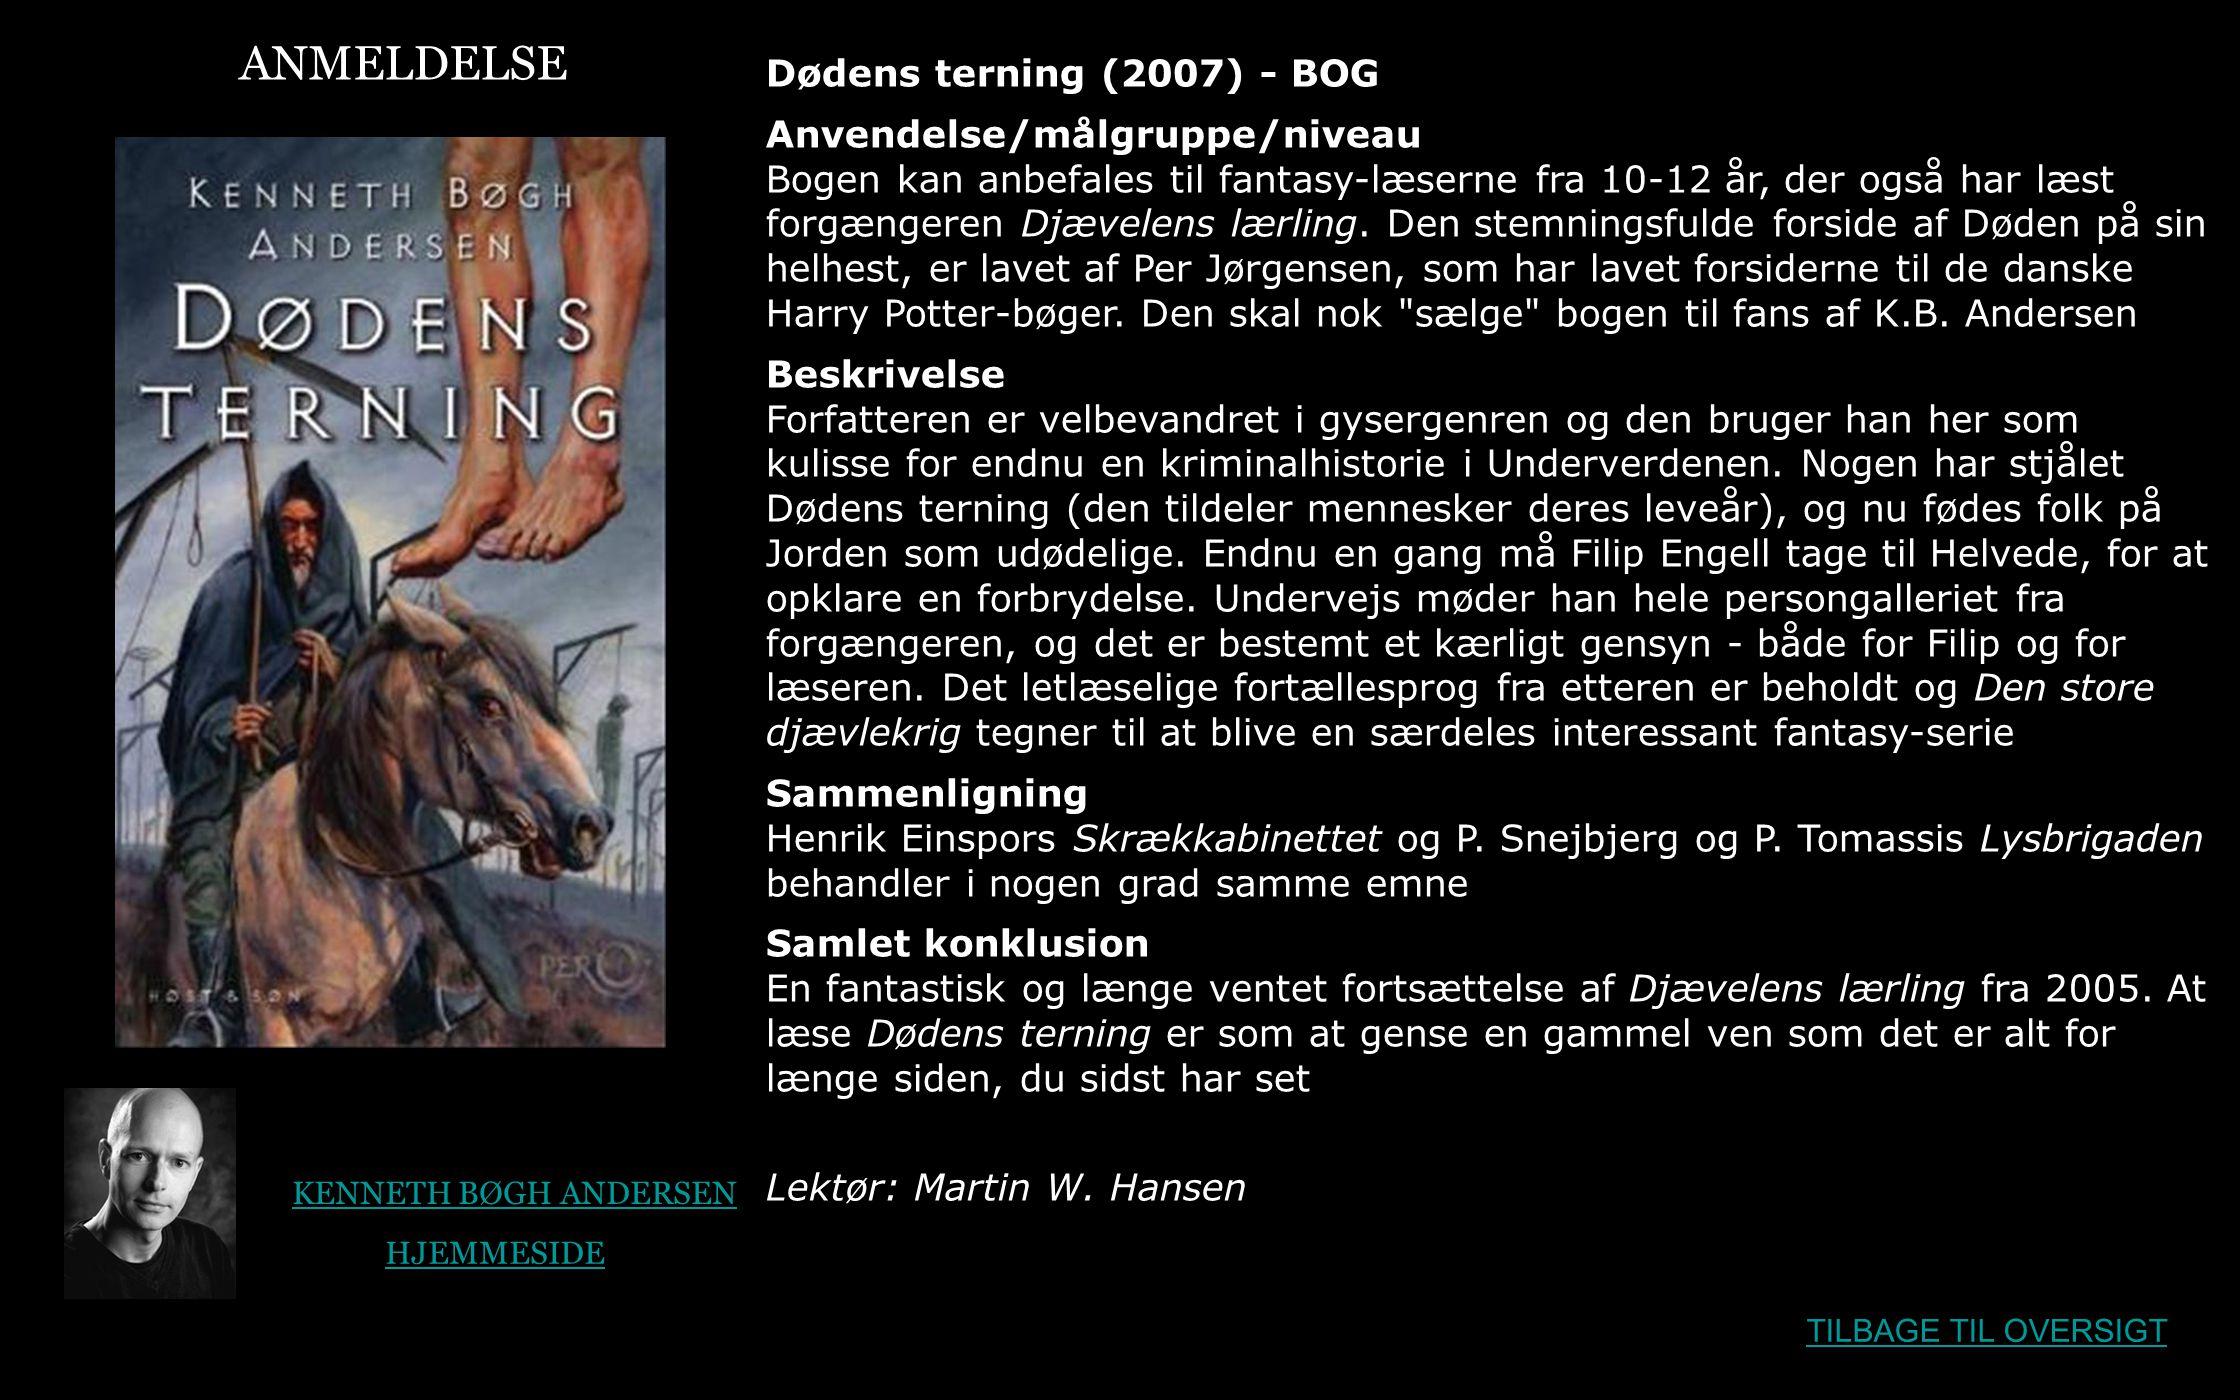 ANMELDELSE Dødens terning (2007) - BOG